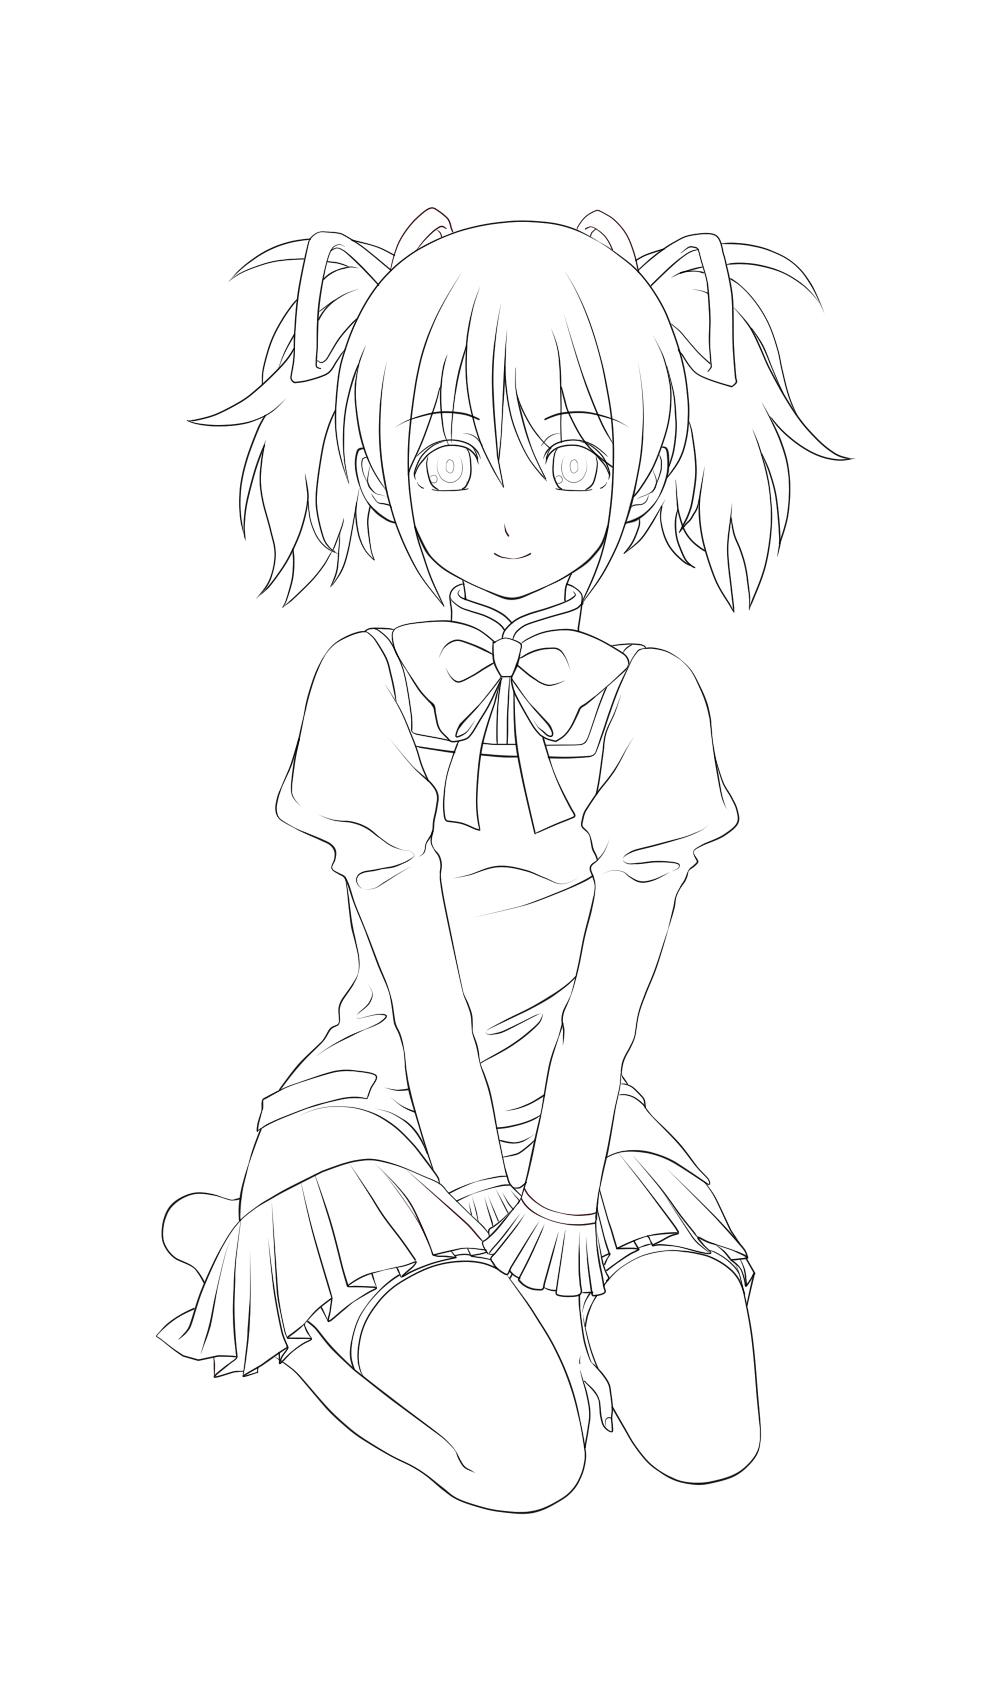 Zerochan Lineart : Kaname madoka mahou shoujo madoka☆magica image